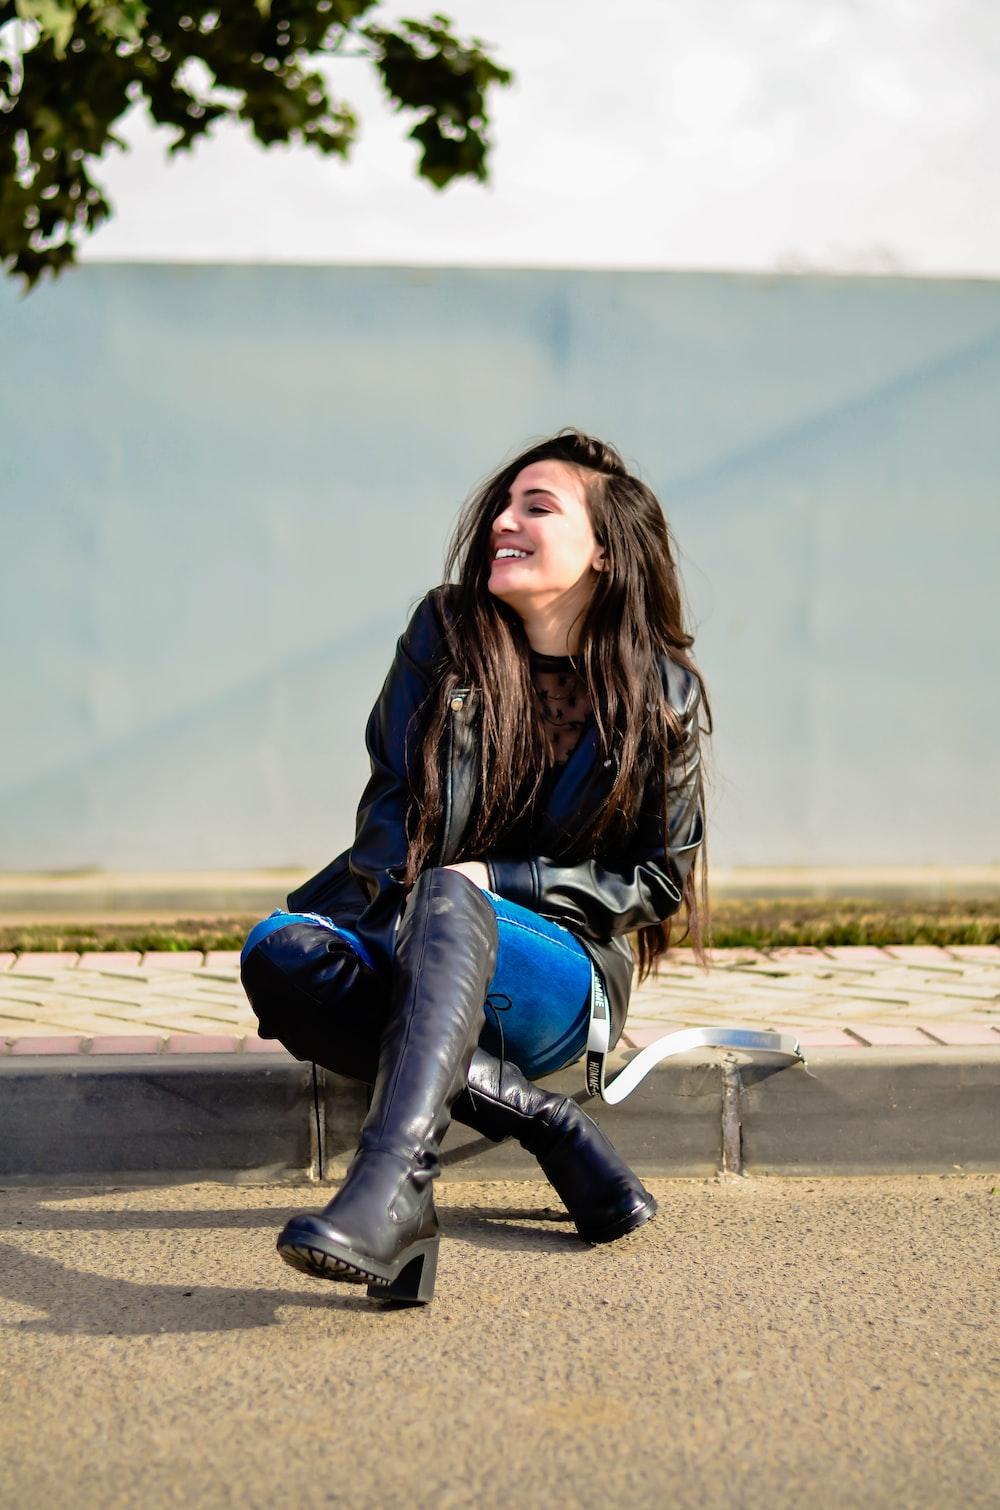 smiling woman sitting on pavement near tree